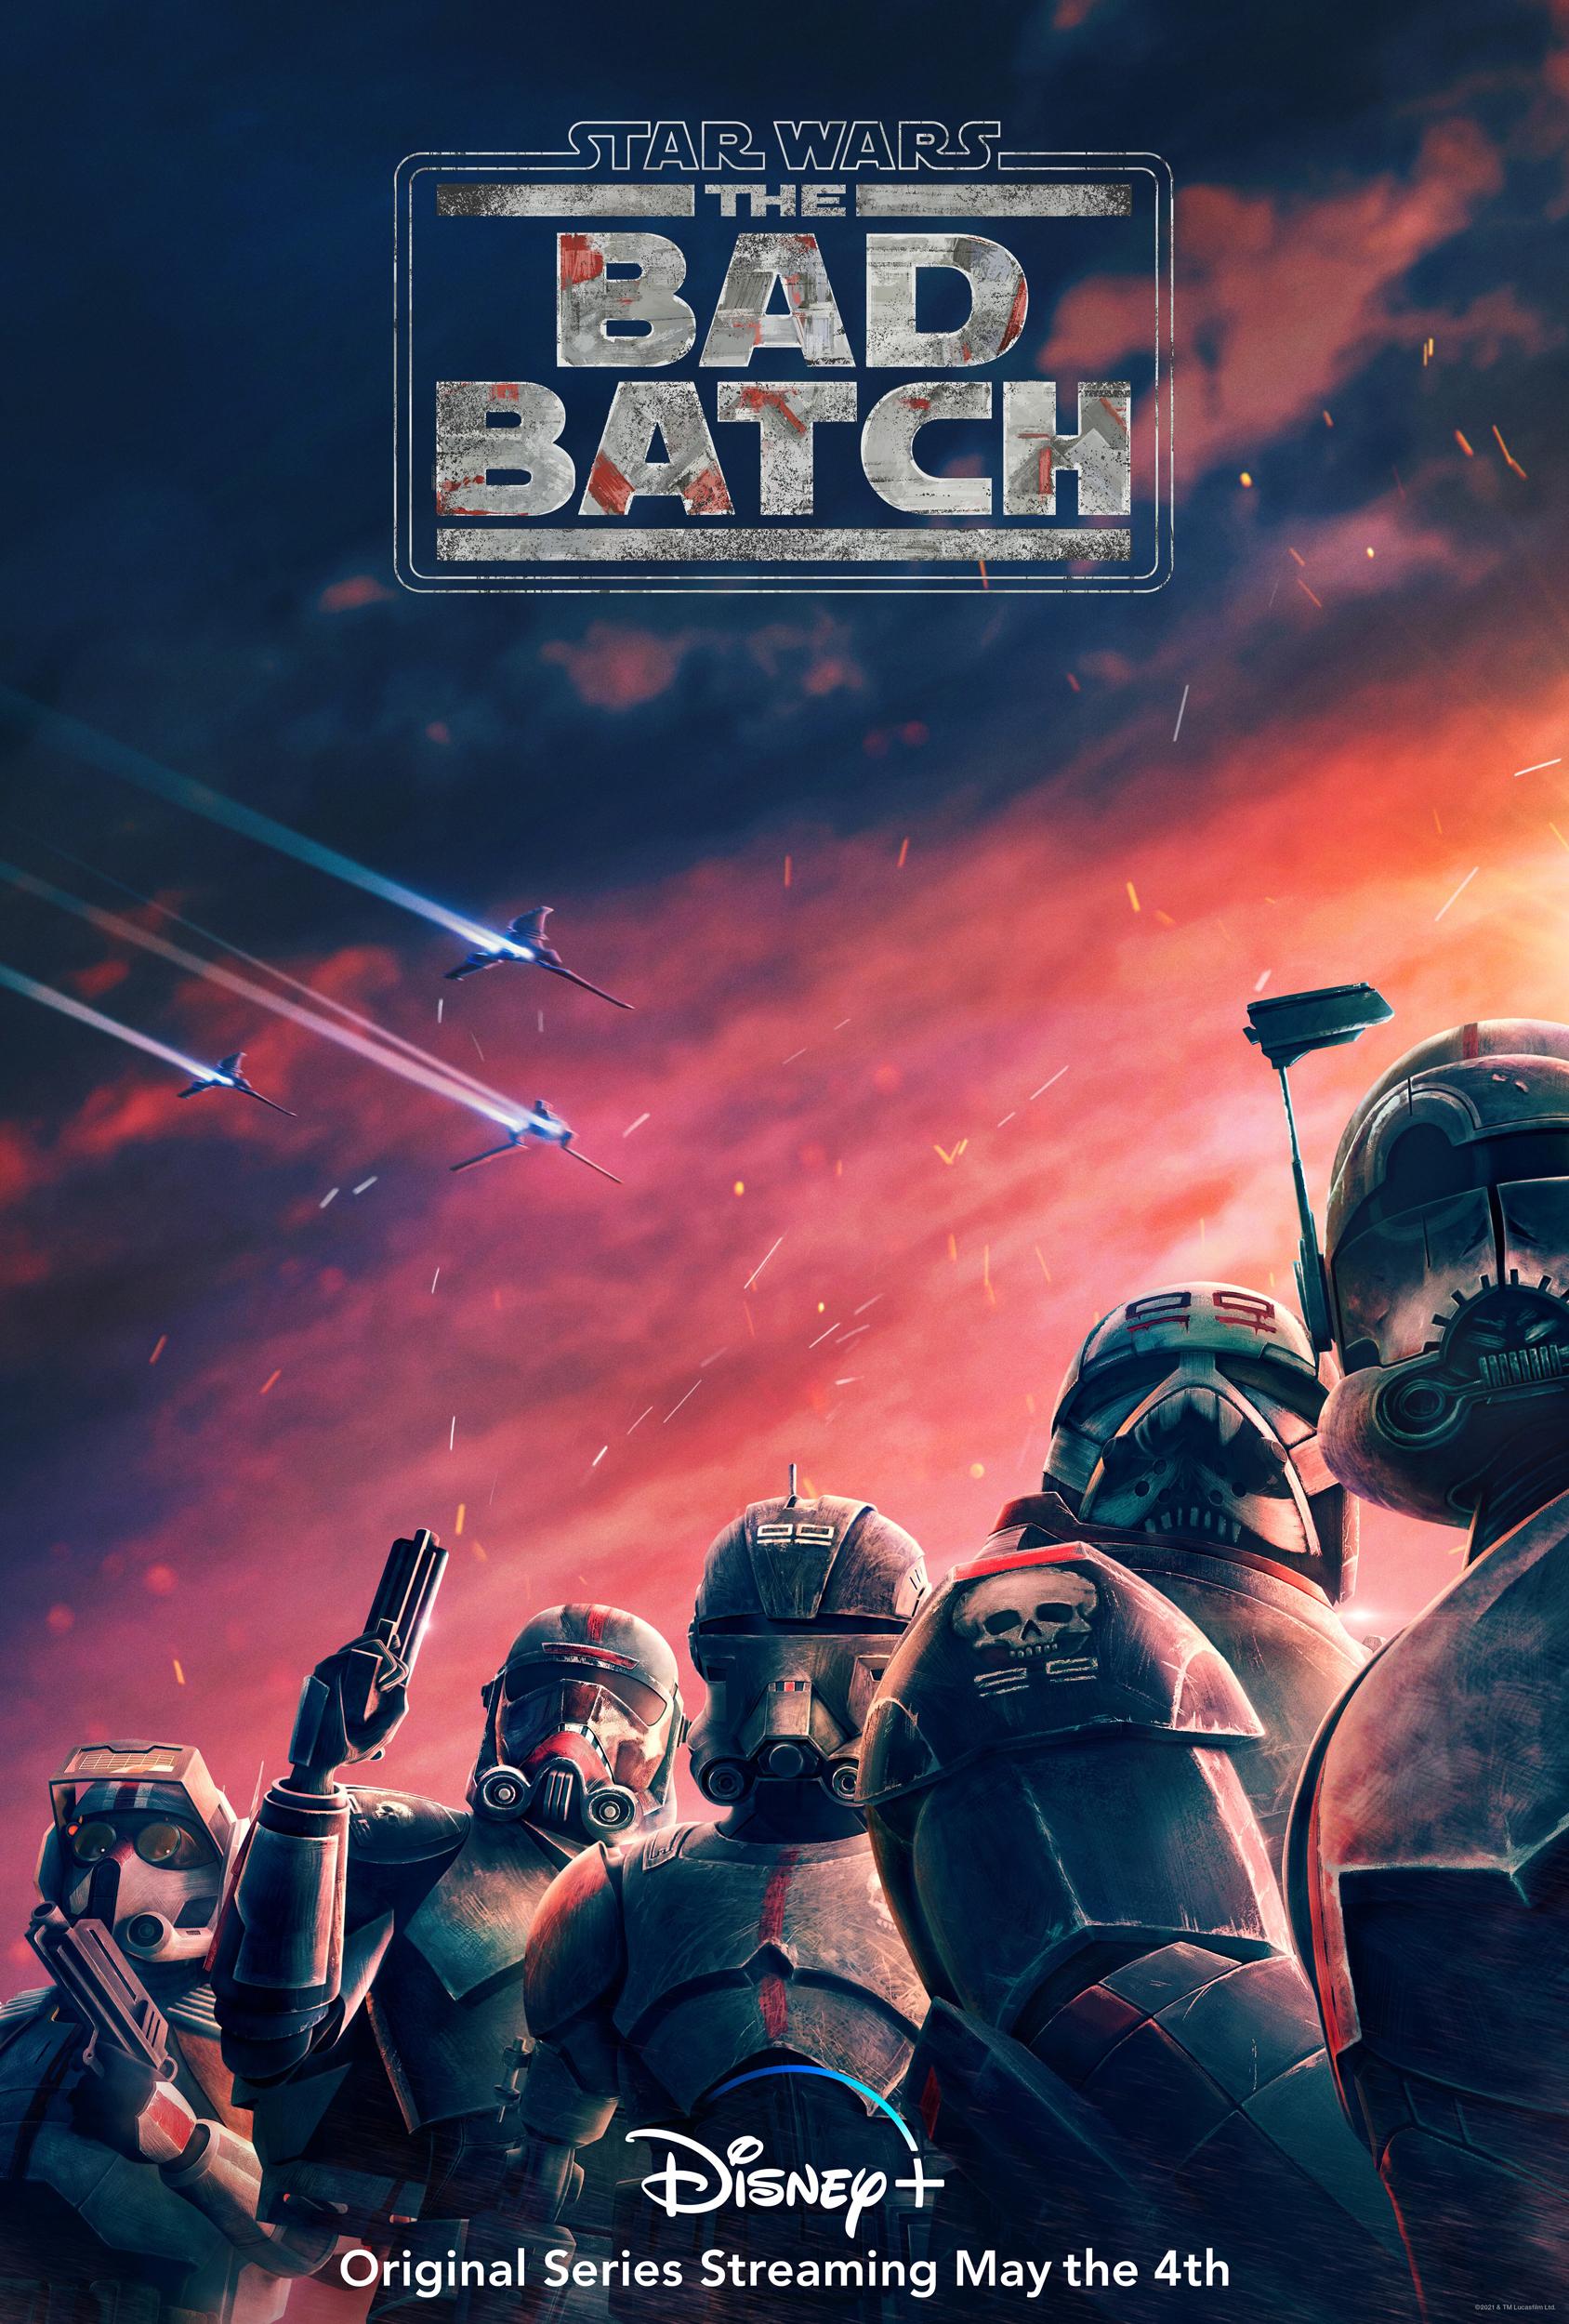 Star Wars Bad Batch Bad Batch Star Wars Clone Trooper TV Series Poster Portrait Display Spaceship 1688x2500